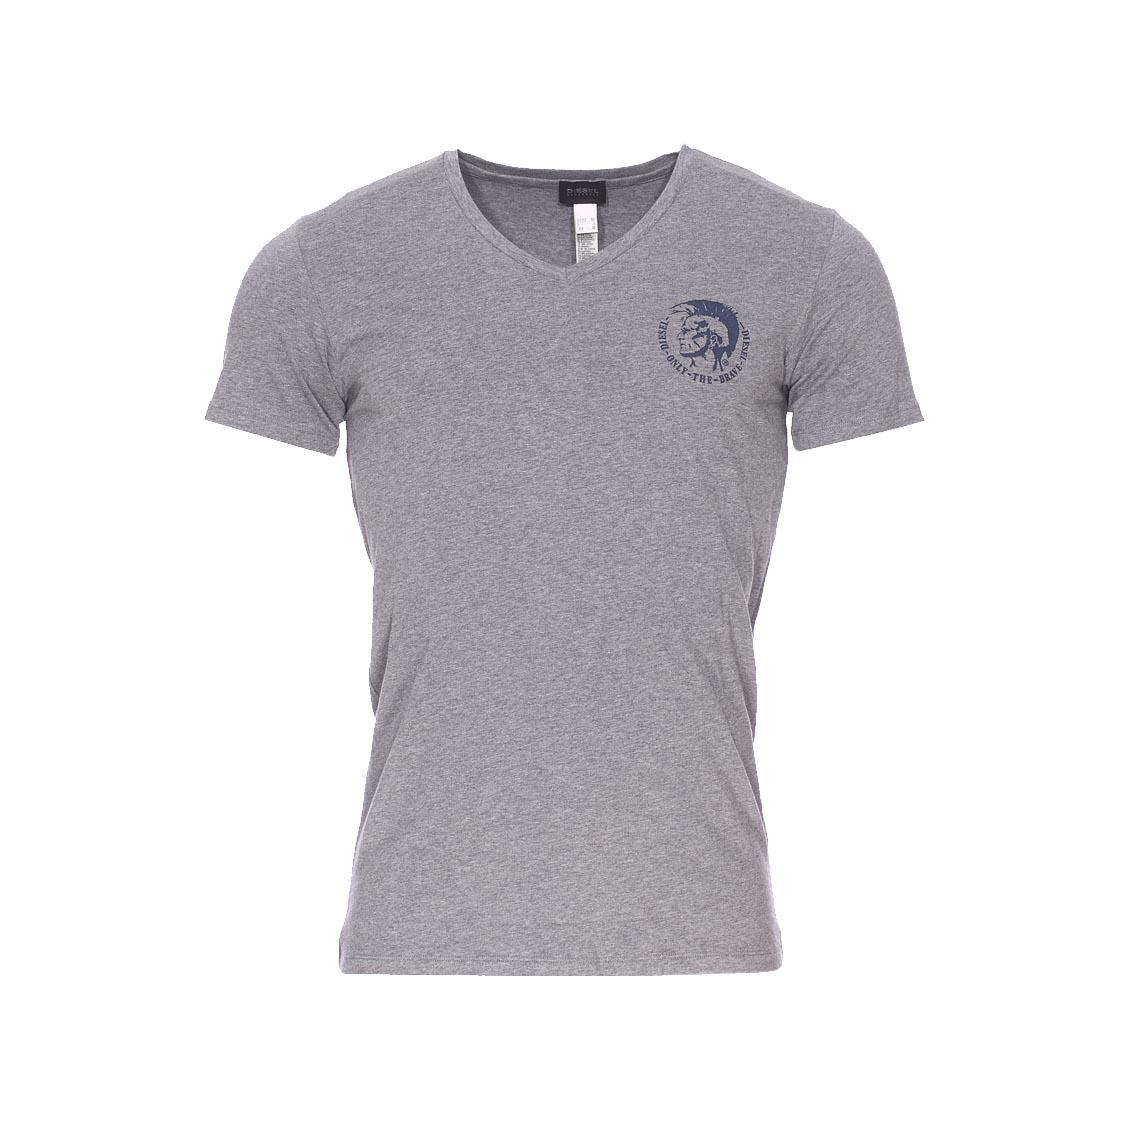 Tee-shirt col v diesel en coton stretch gris chiné